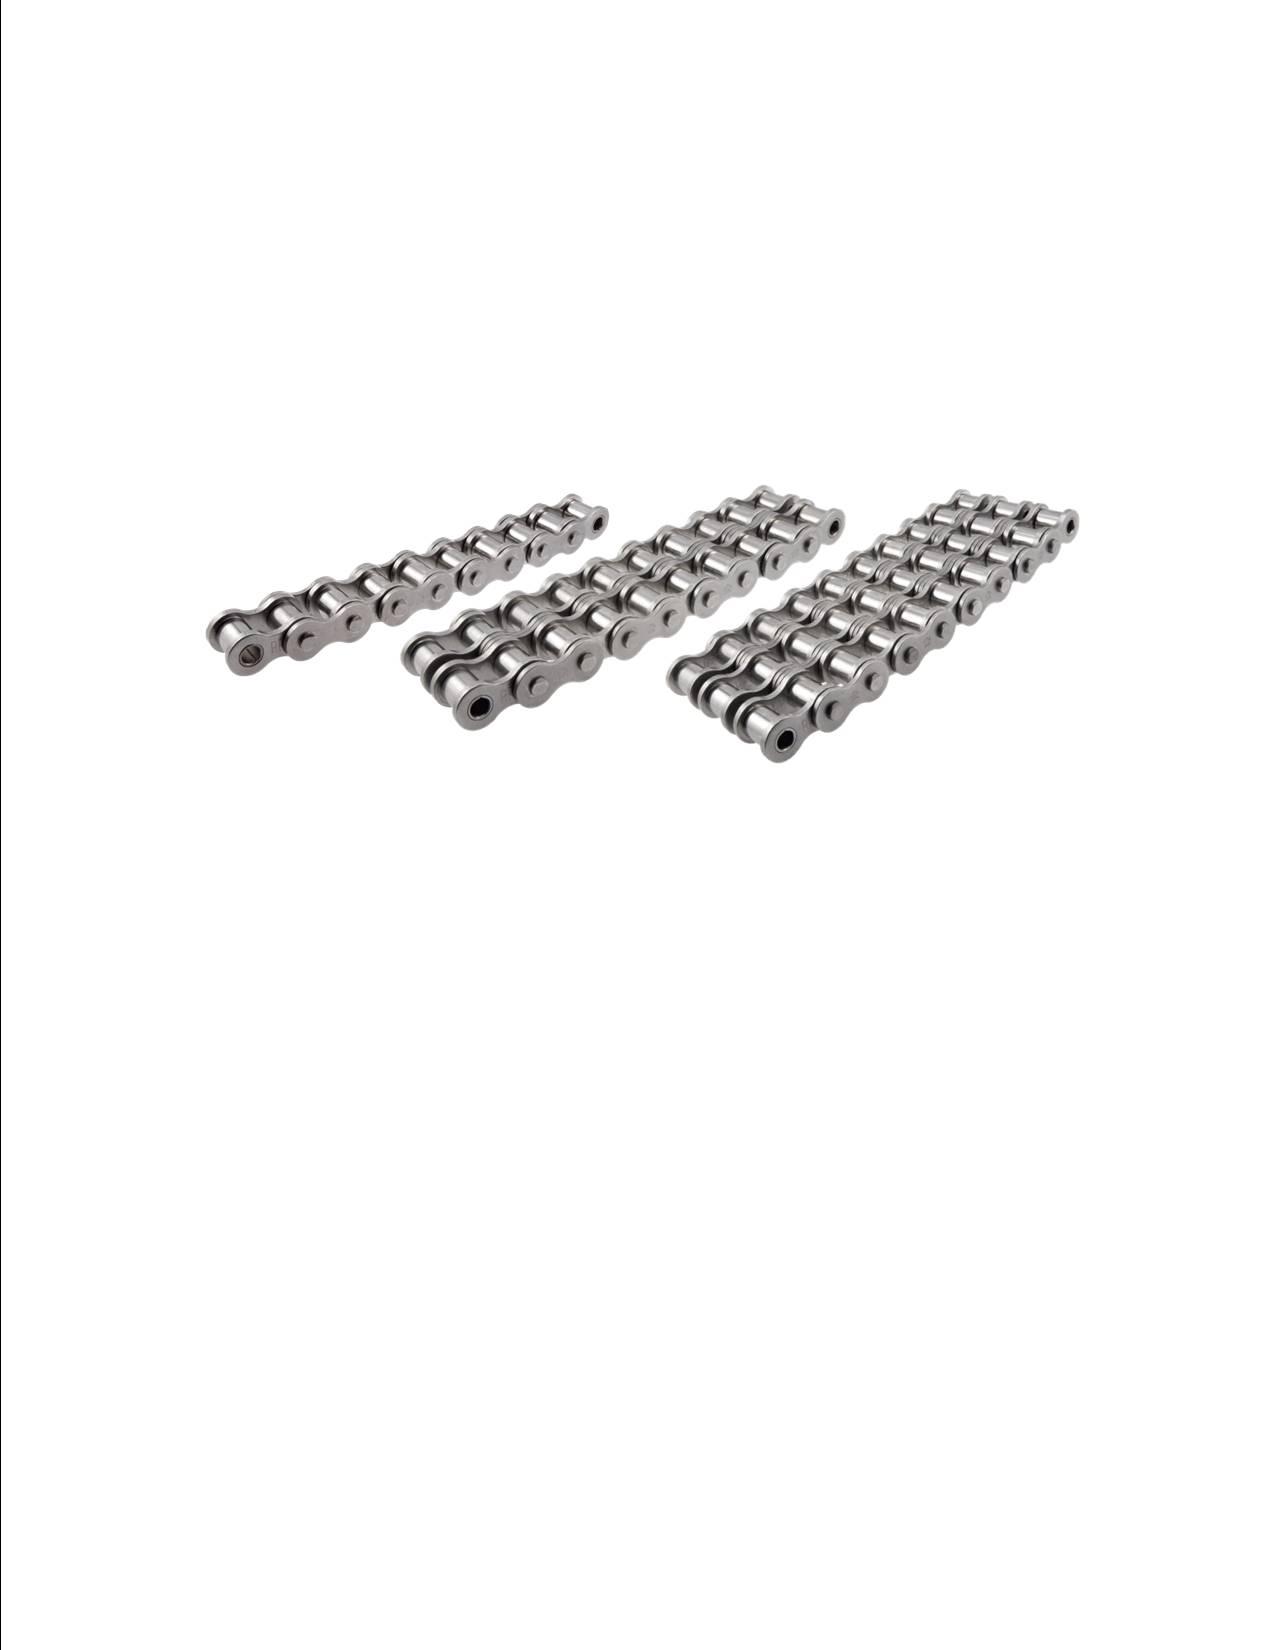 Standard ANSI Roller Chain